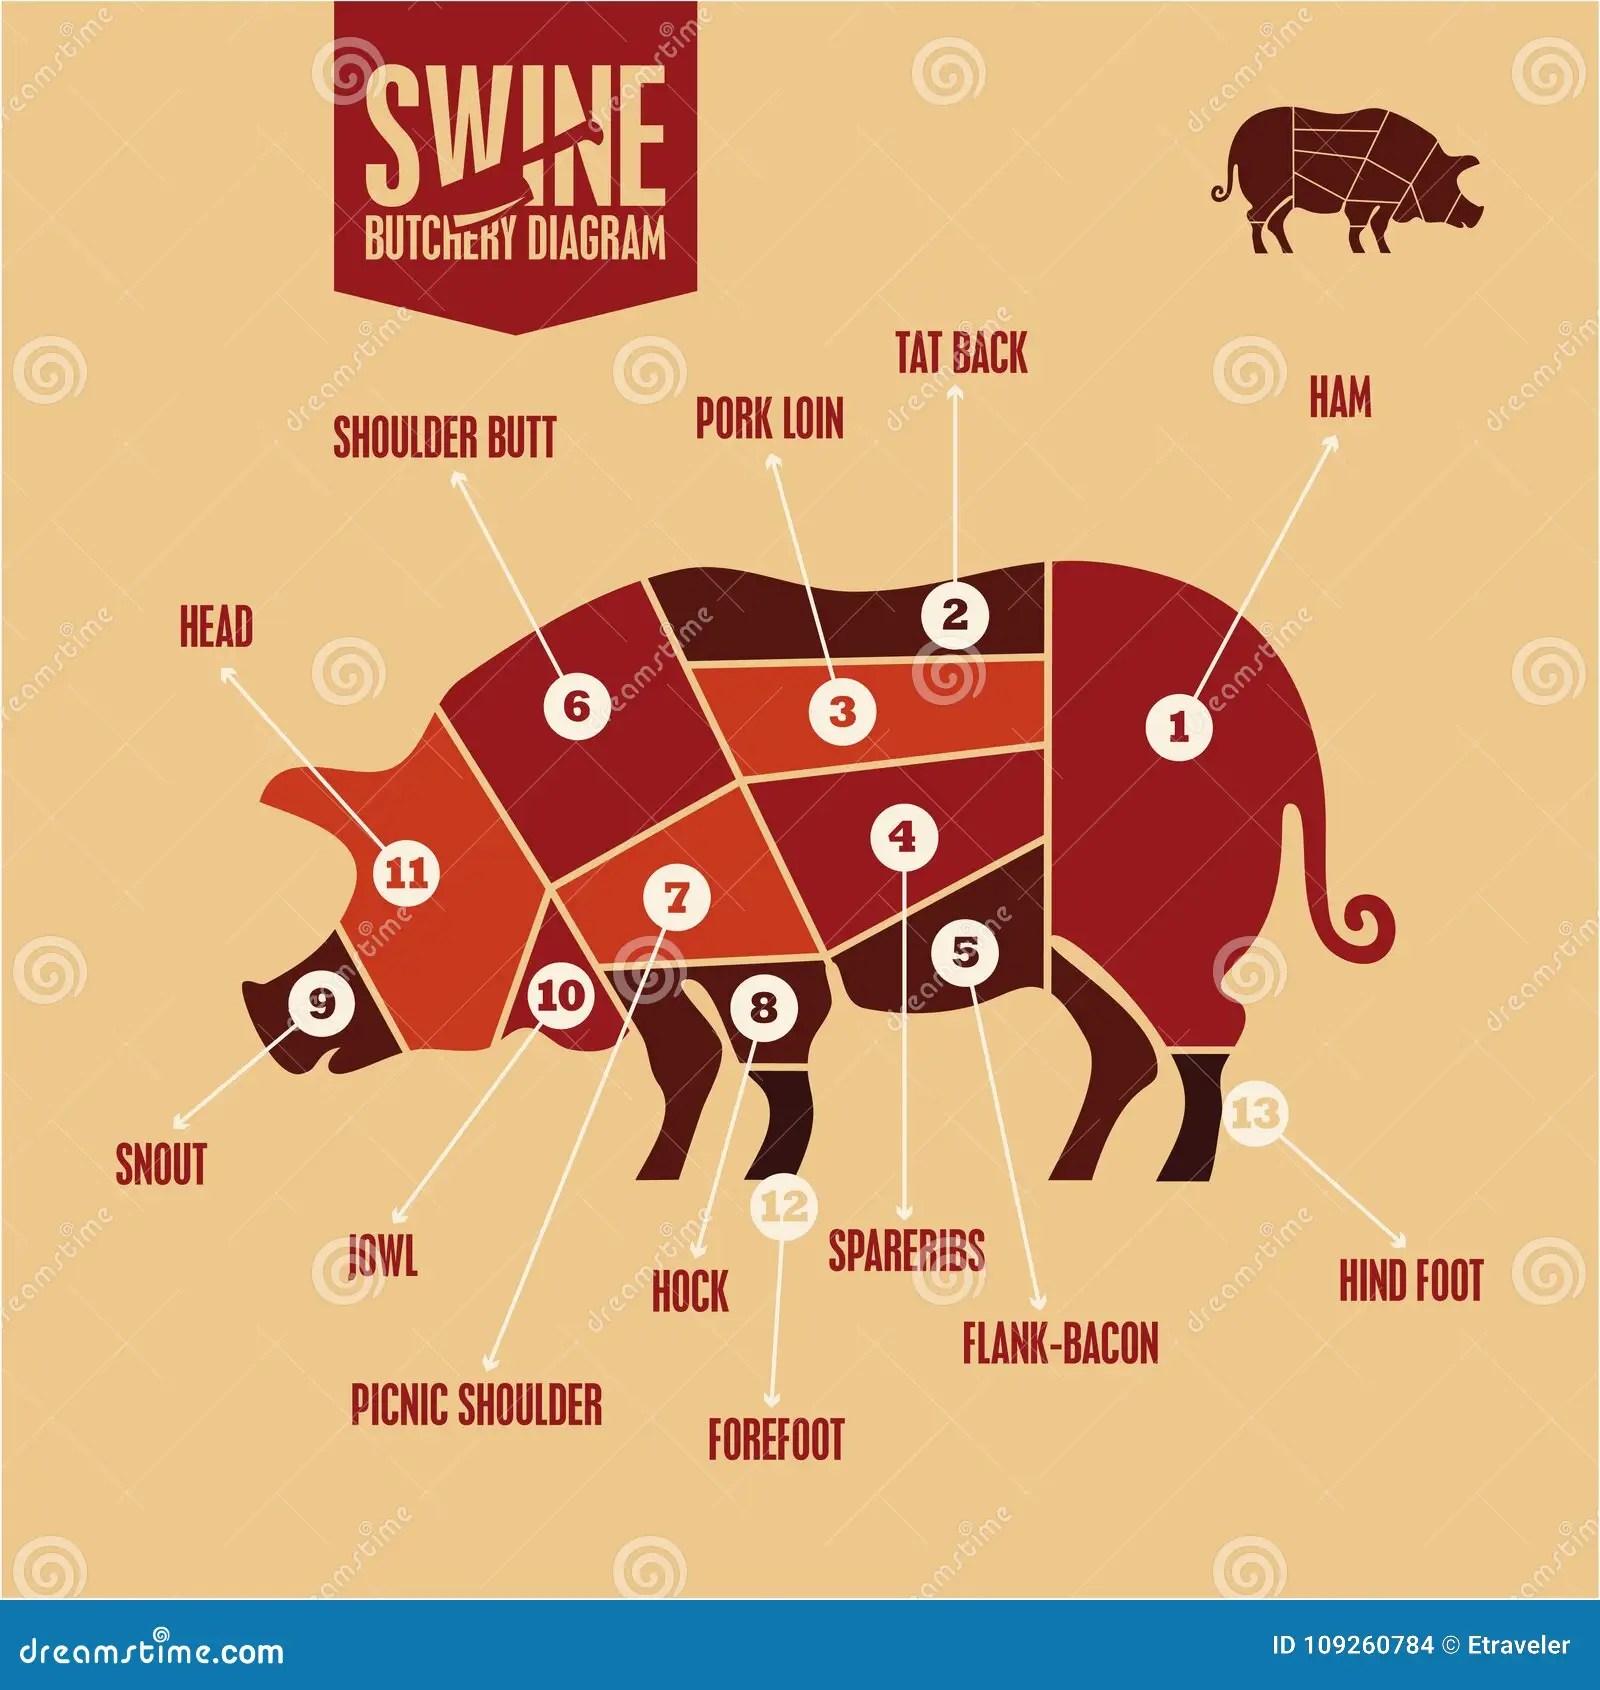 pork butcher cuts diagram 2004 volkswagen jetta wiring of in color swine butchery barbecue meat